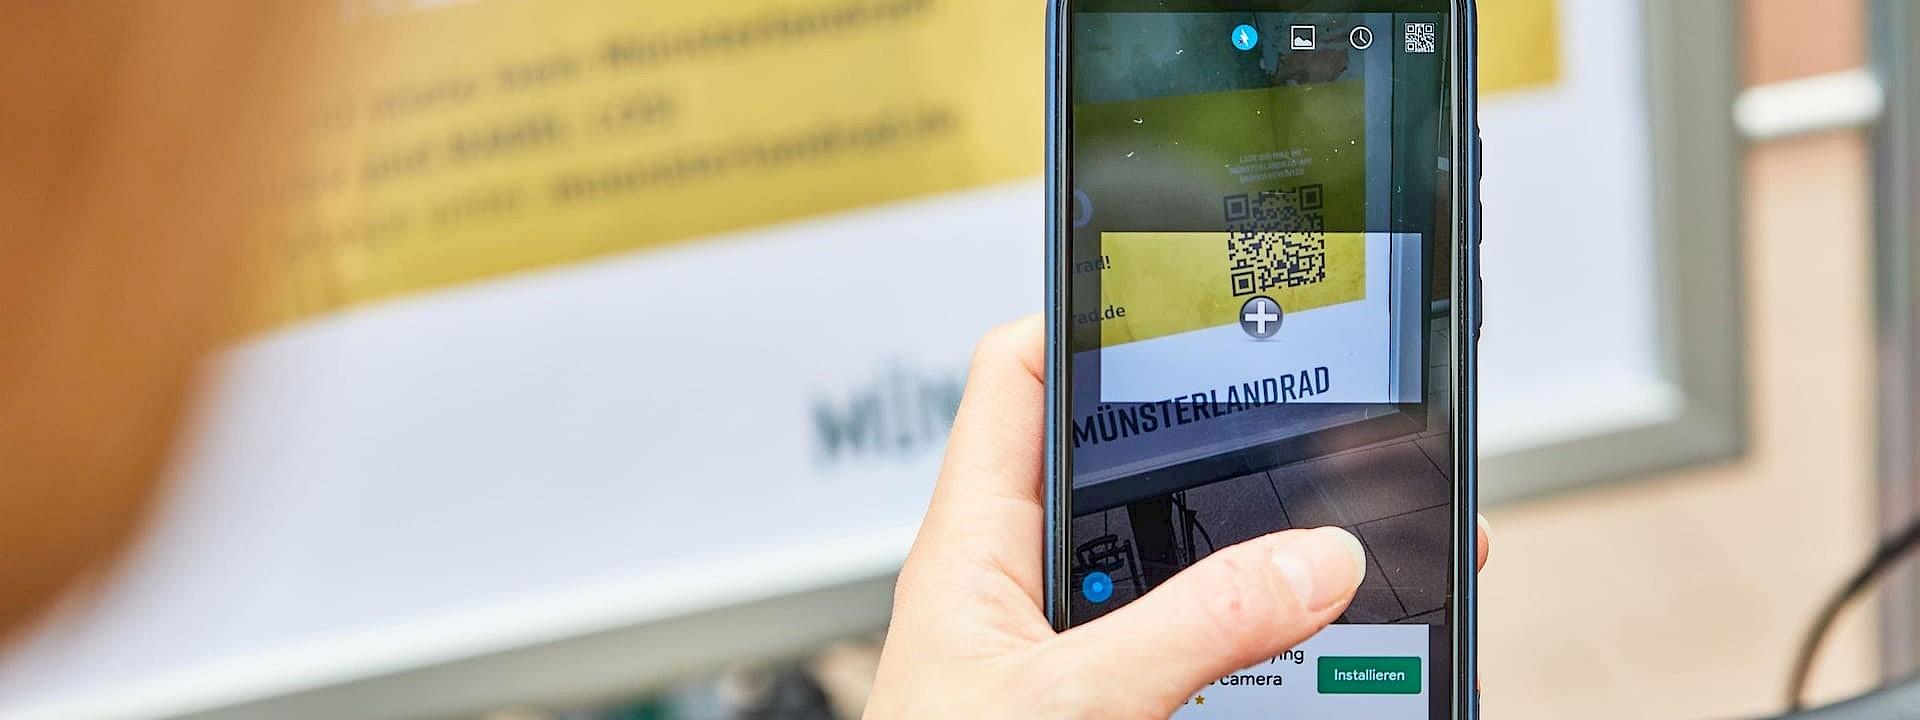 Miete dein MünsterlandRad